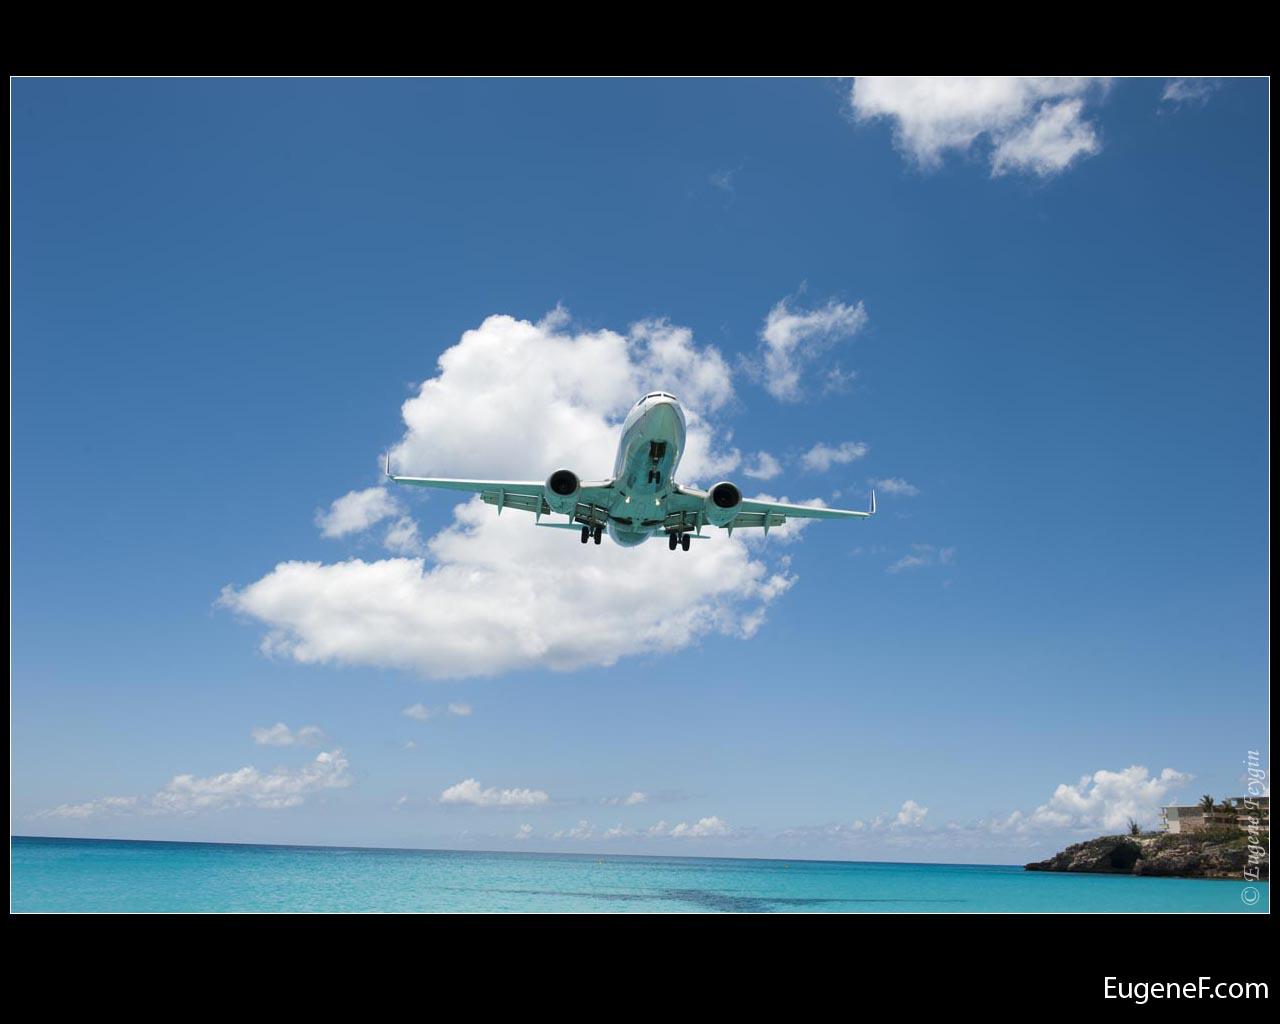 Airplane Descending